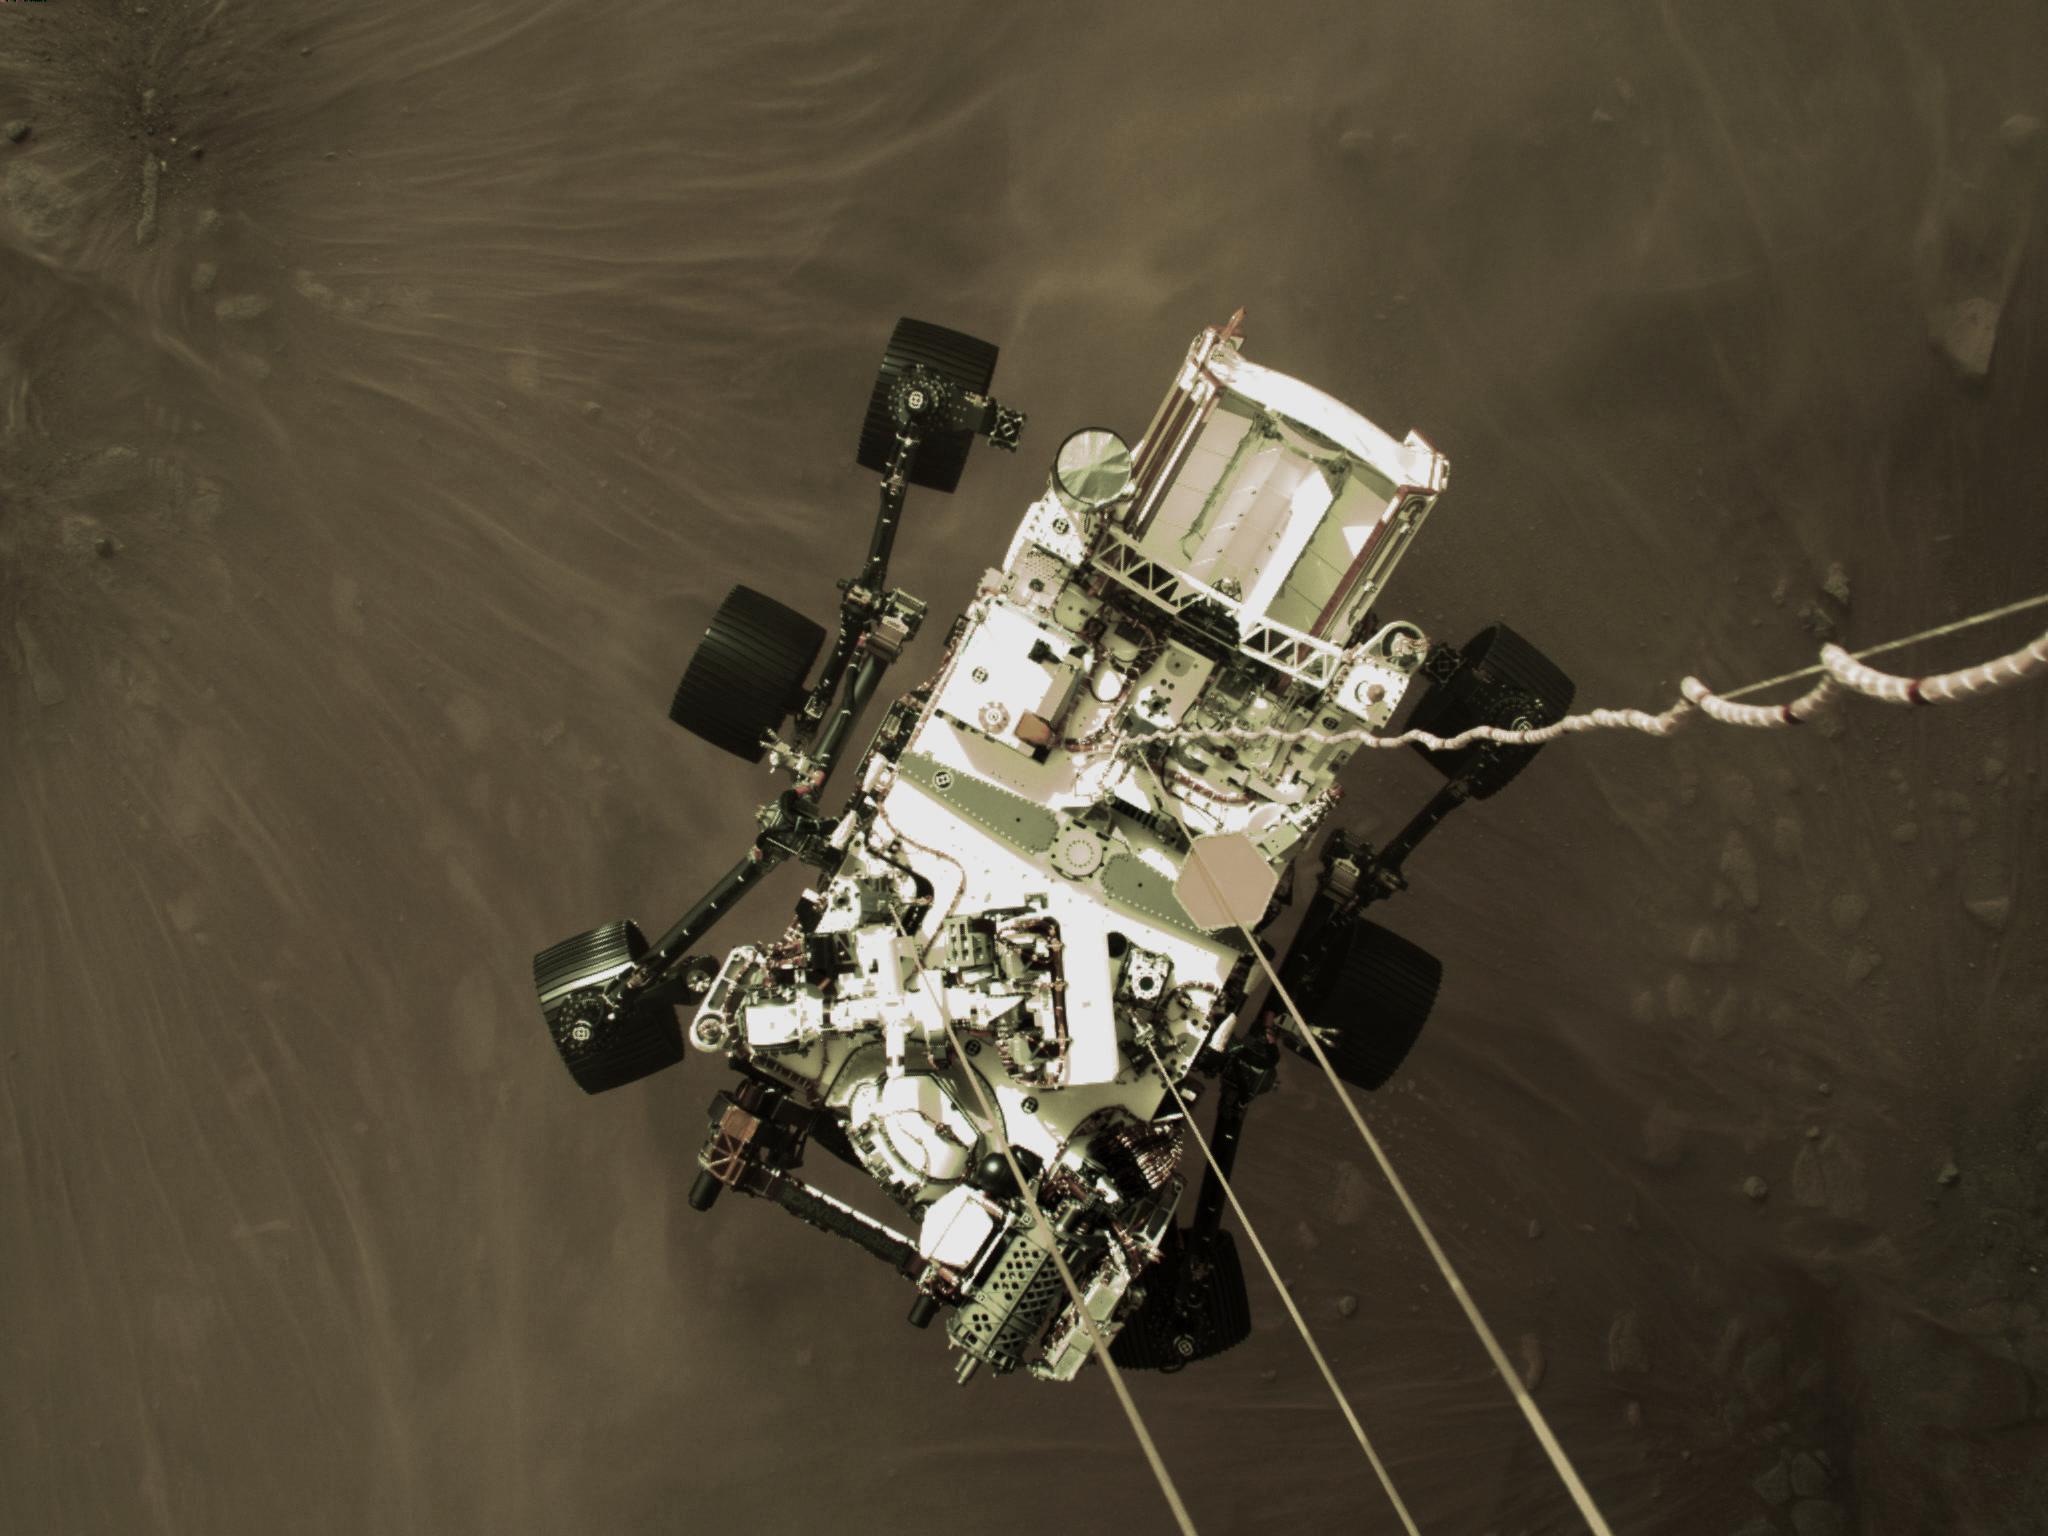 Perseverance Rover Beams Back Iconic Landing Image Selfie